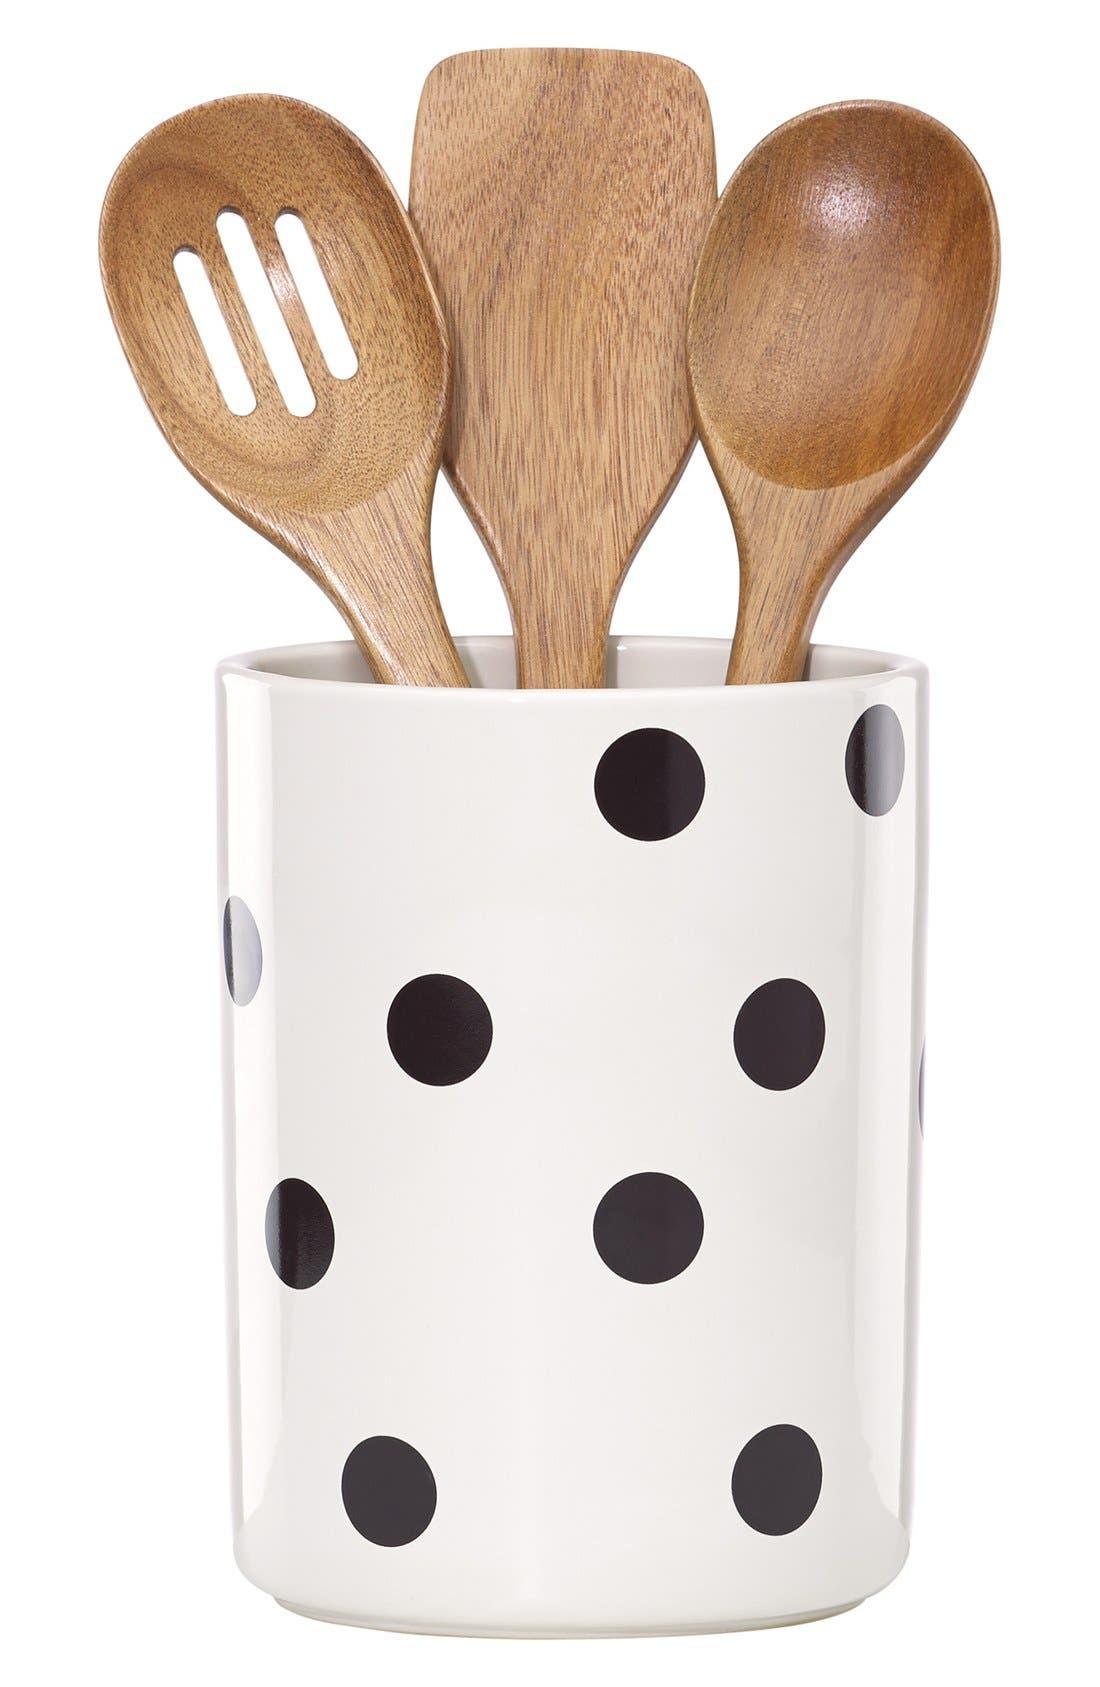 'all in good taste' 'deco' utensil crock & wooden spoons,                             Main thumbnail 1, color,                             100